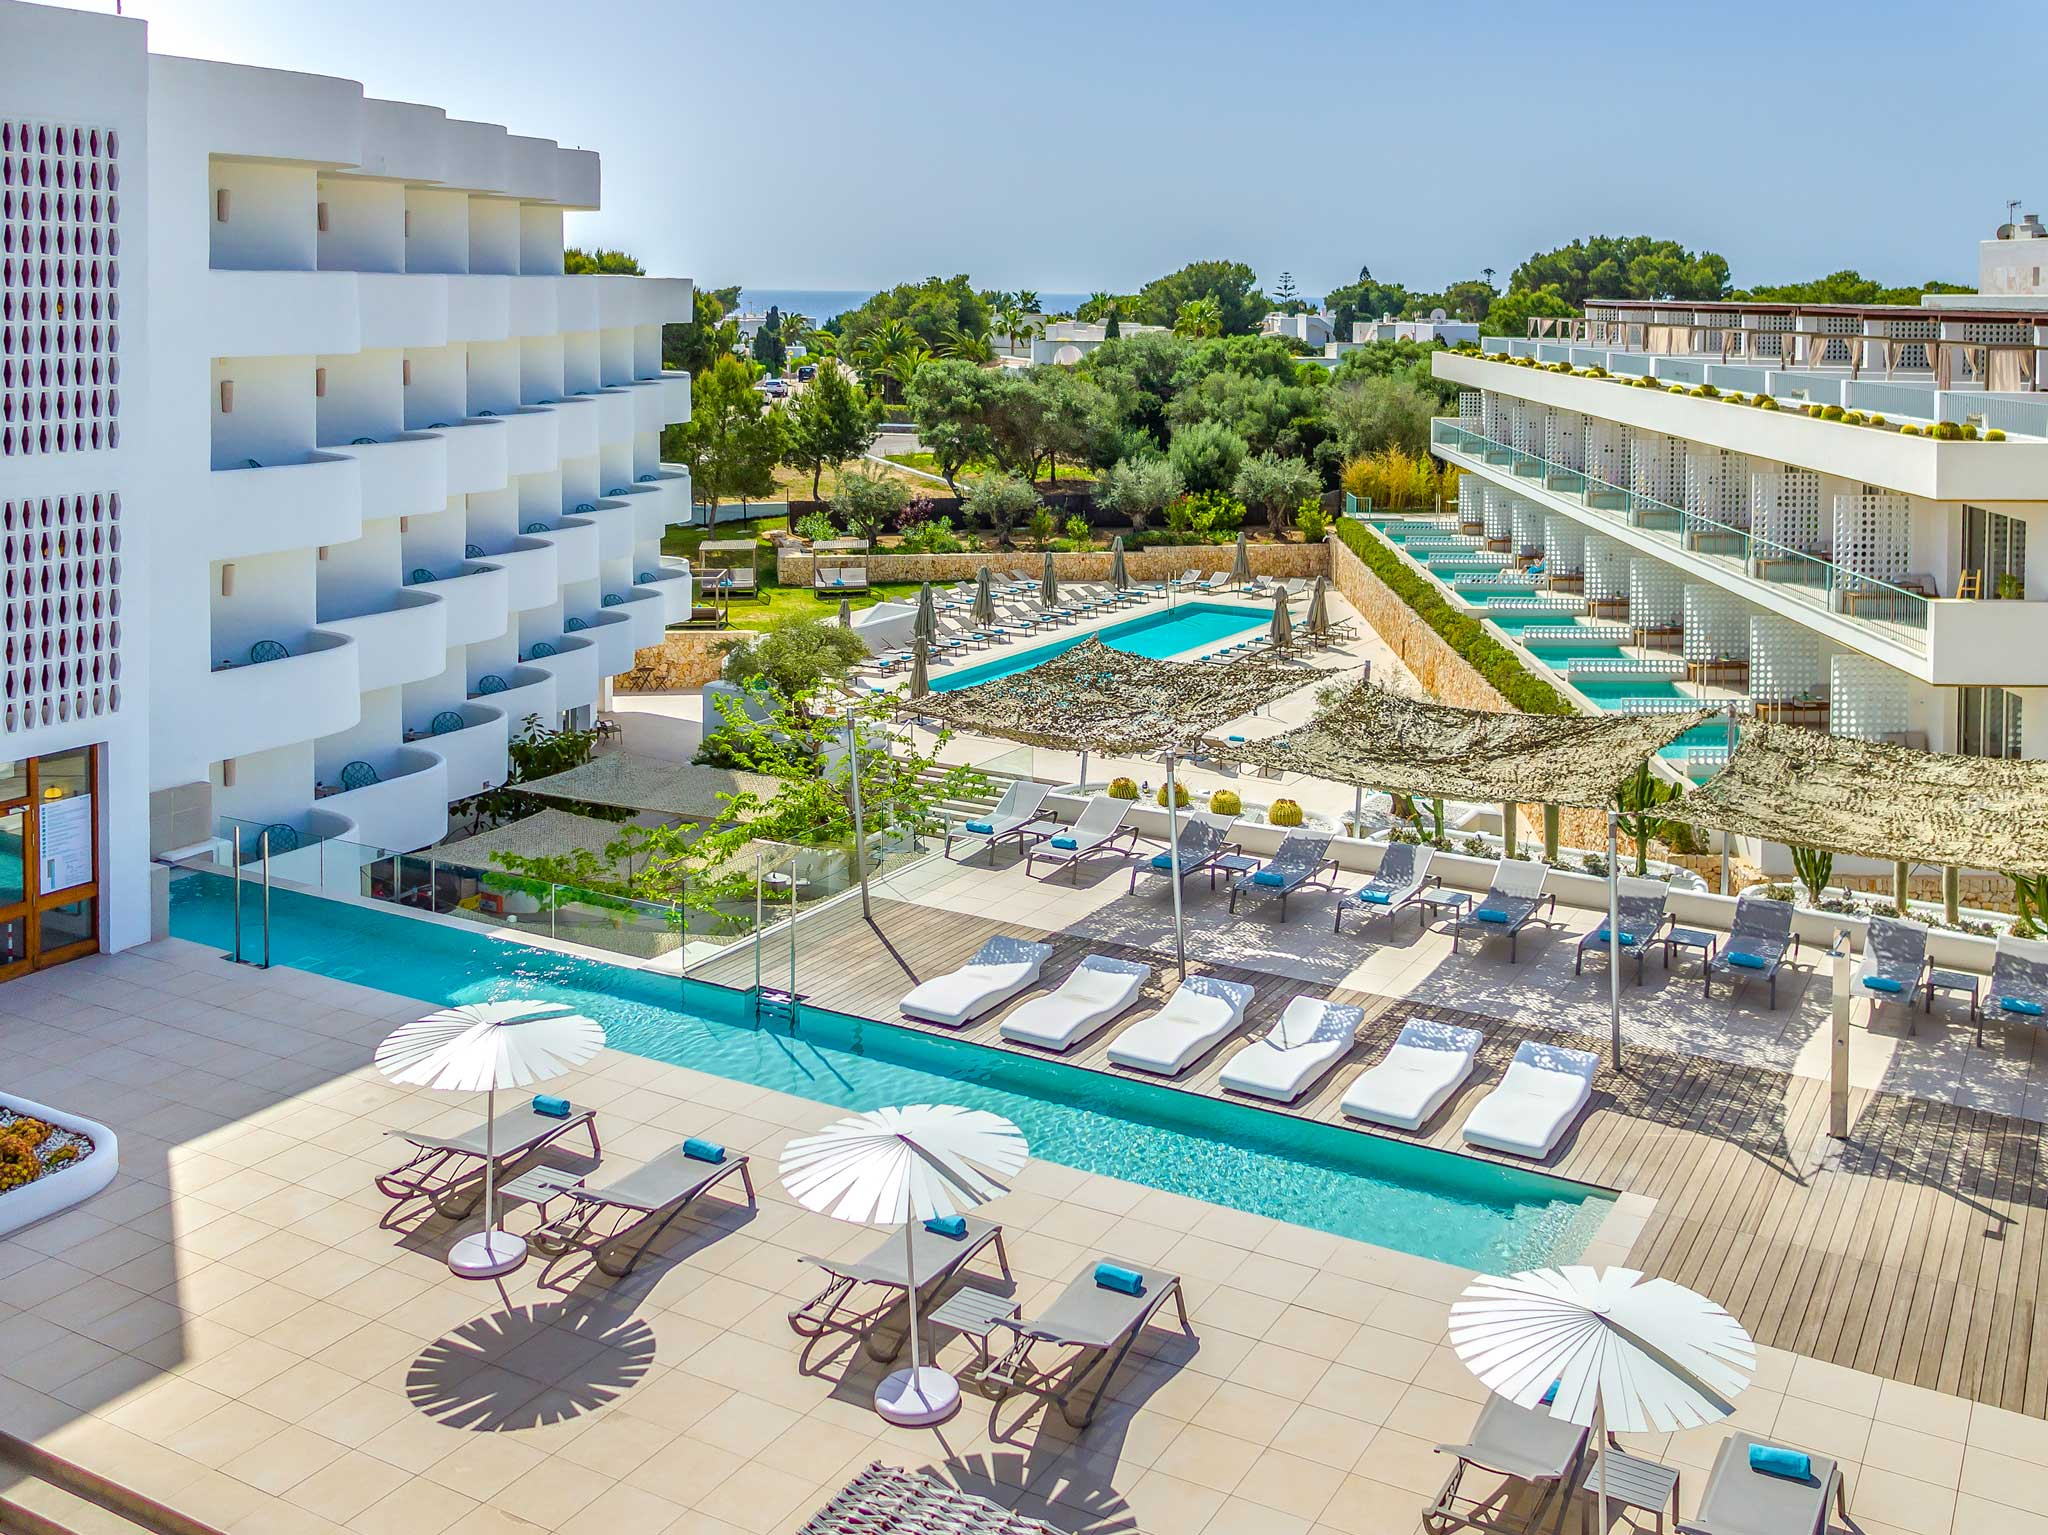 Inturotel Cala Esmeralda Hotel auf Mallorca